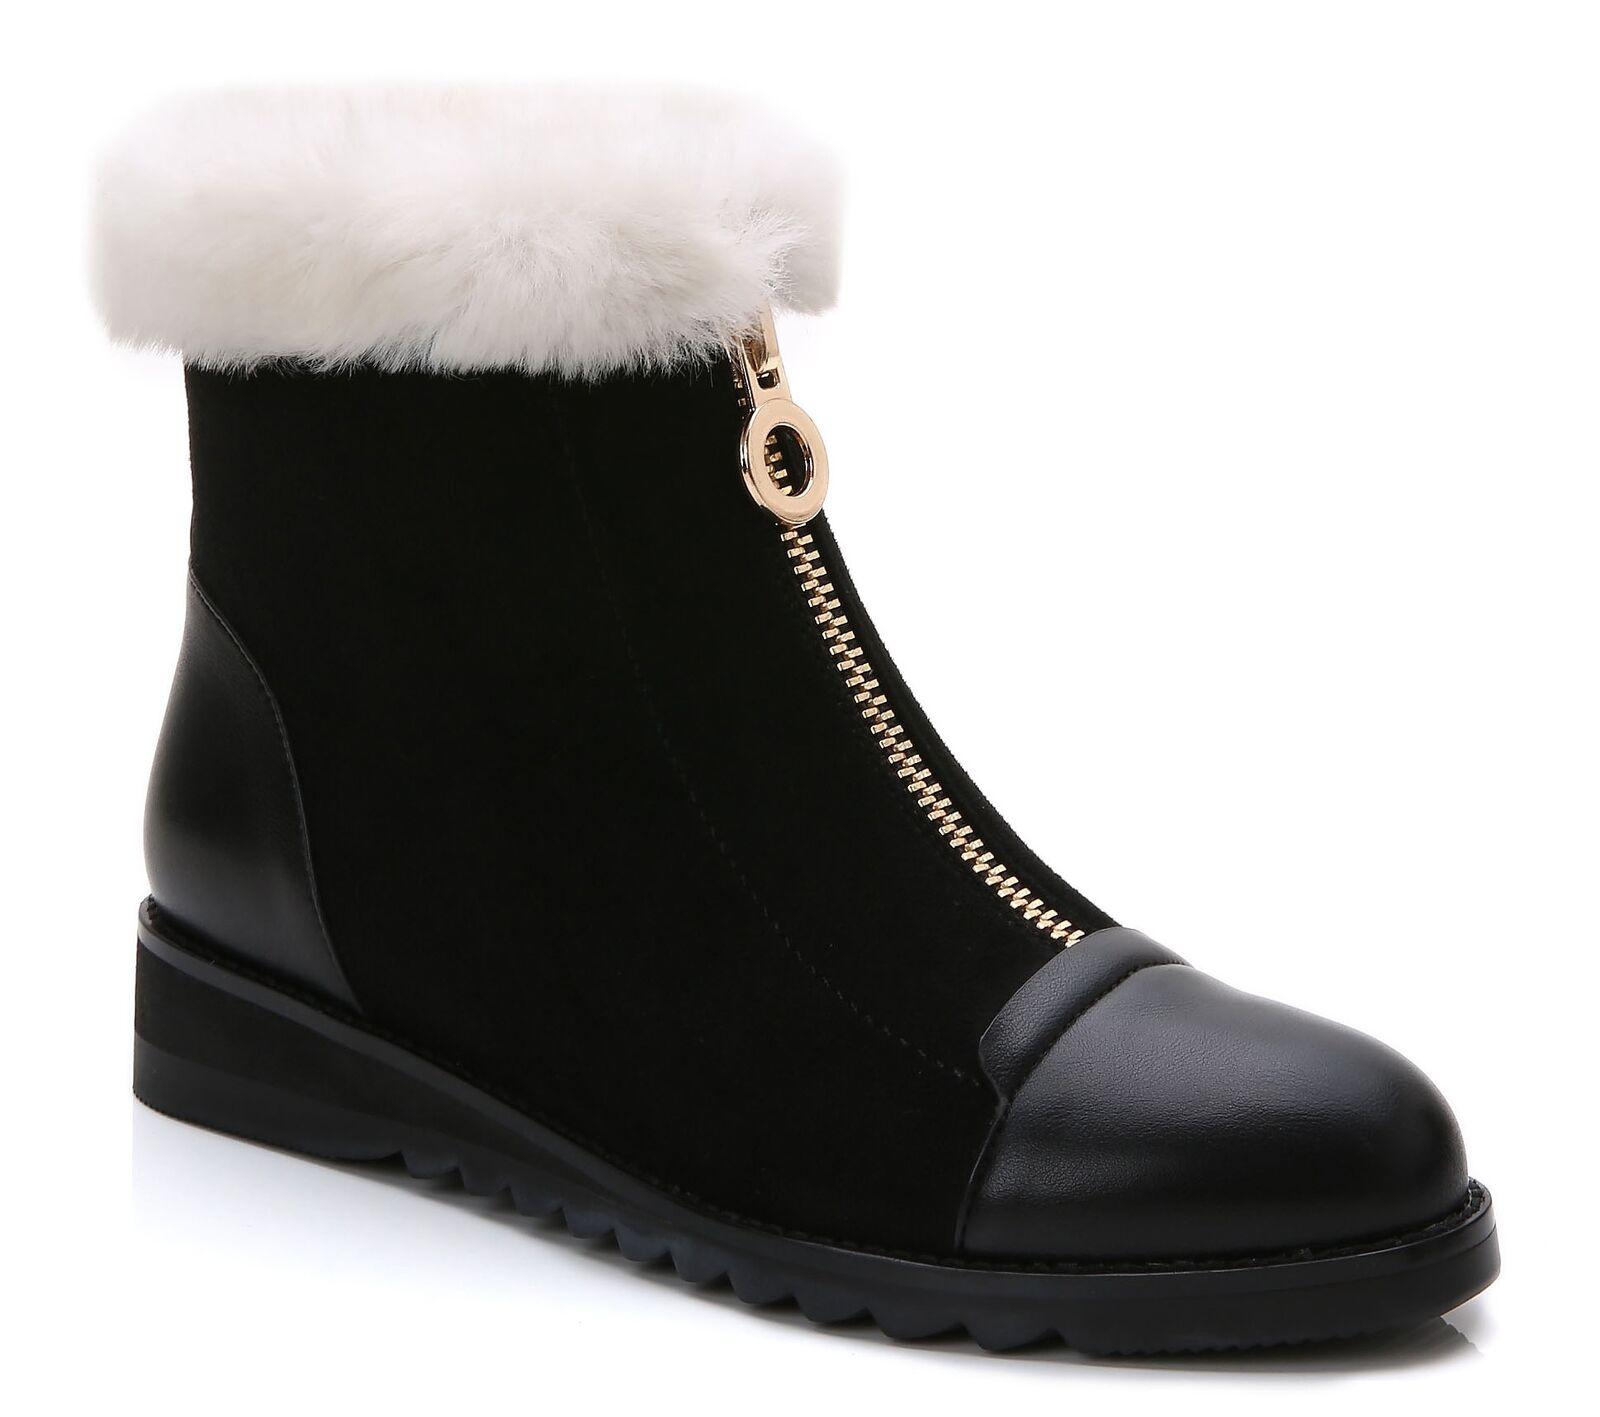 comprare sconti Ann Creek Donna  'Cameia' Enforced Toe Toe Toe Front Zipper avvioies  sconto online